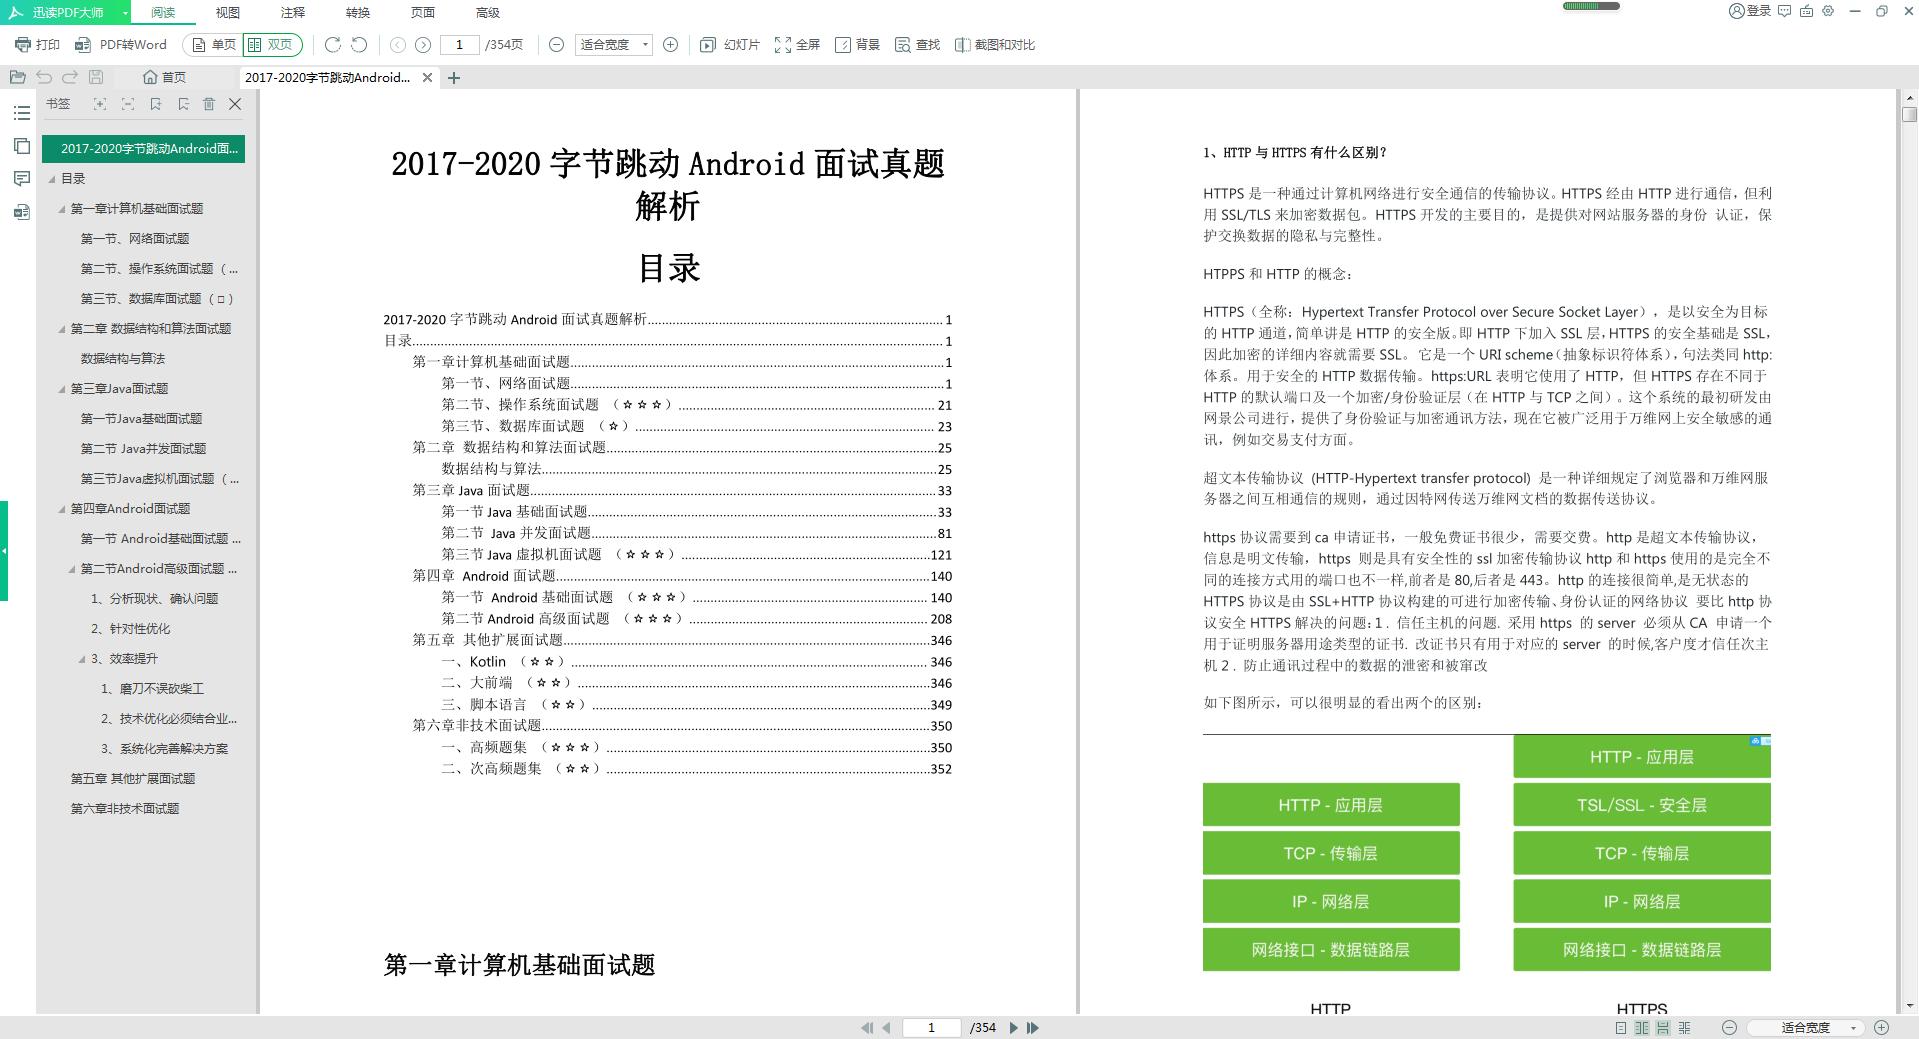 2017-2020字节跳动Android面试真题解析PDF